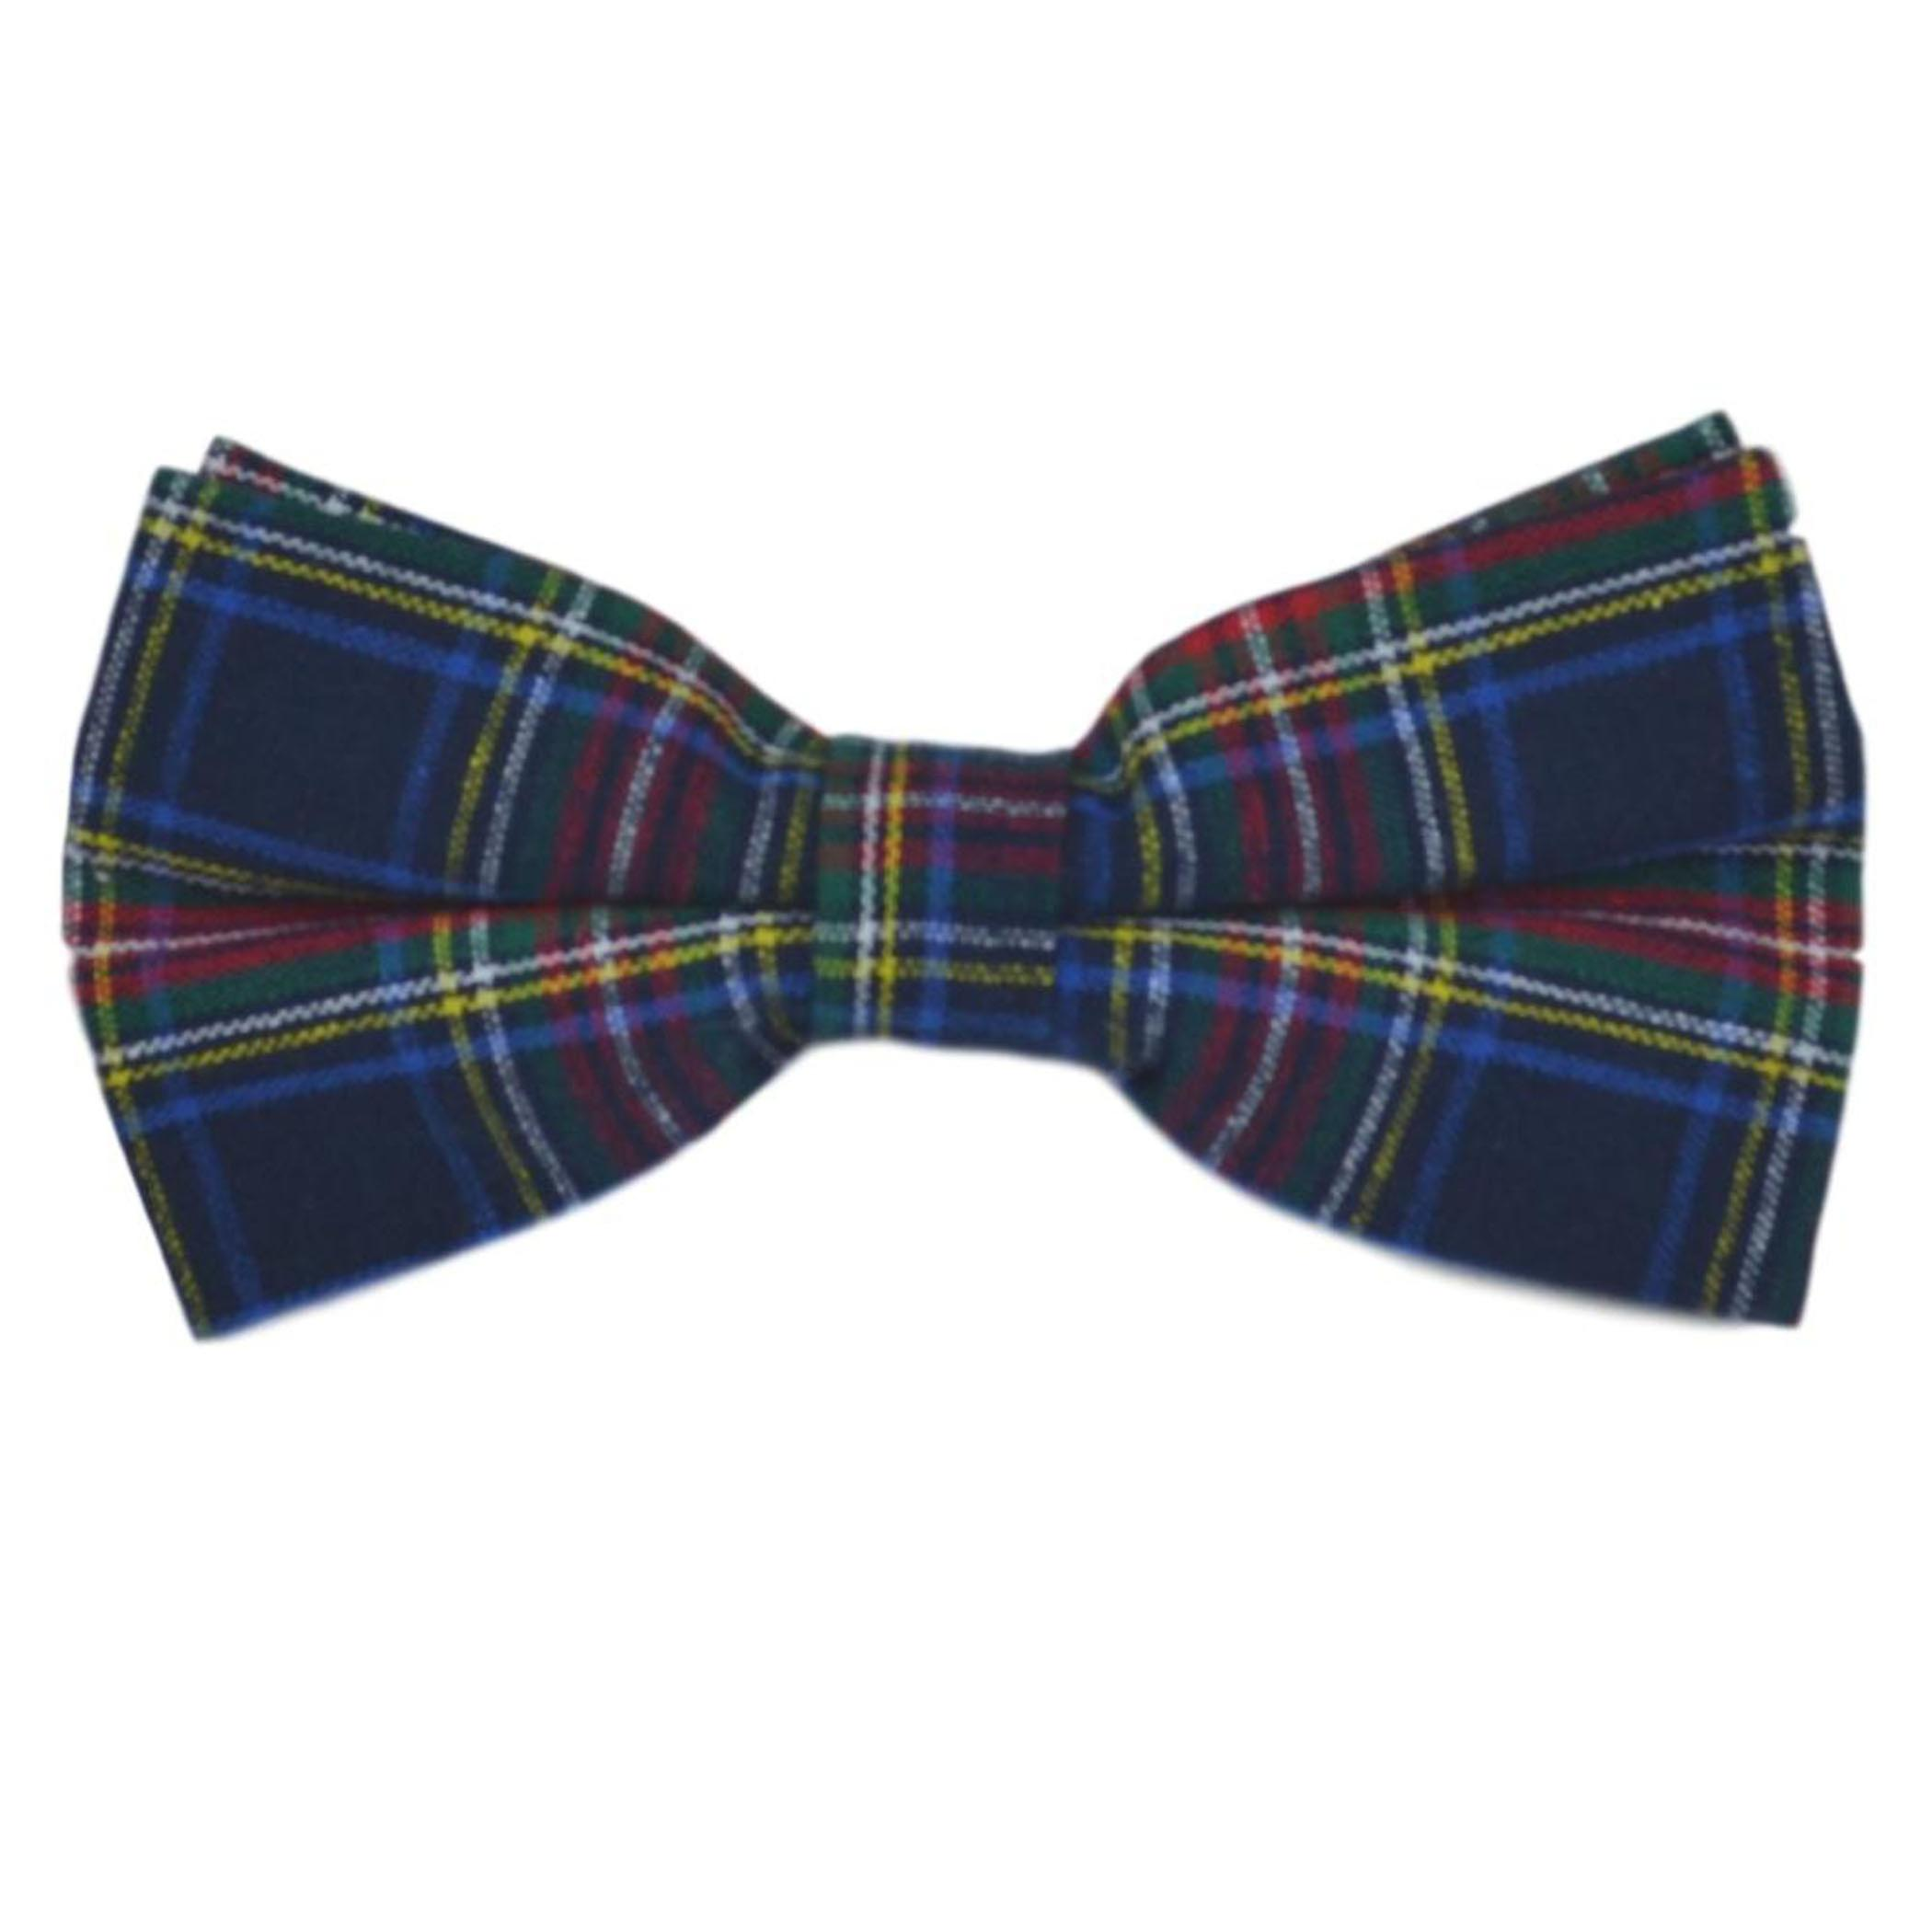 Traditional Navy Blue Tartan Bow Tie & Pocket Square Set, Check, Plaid